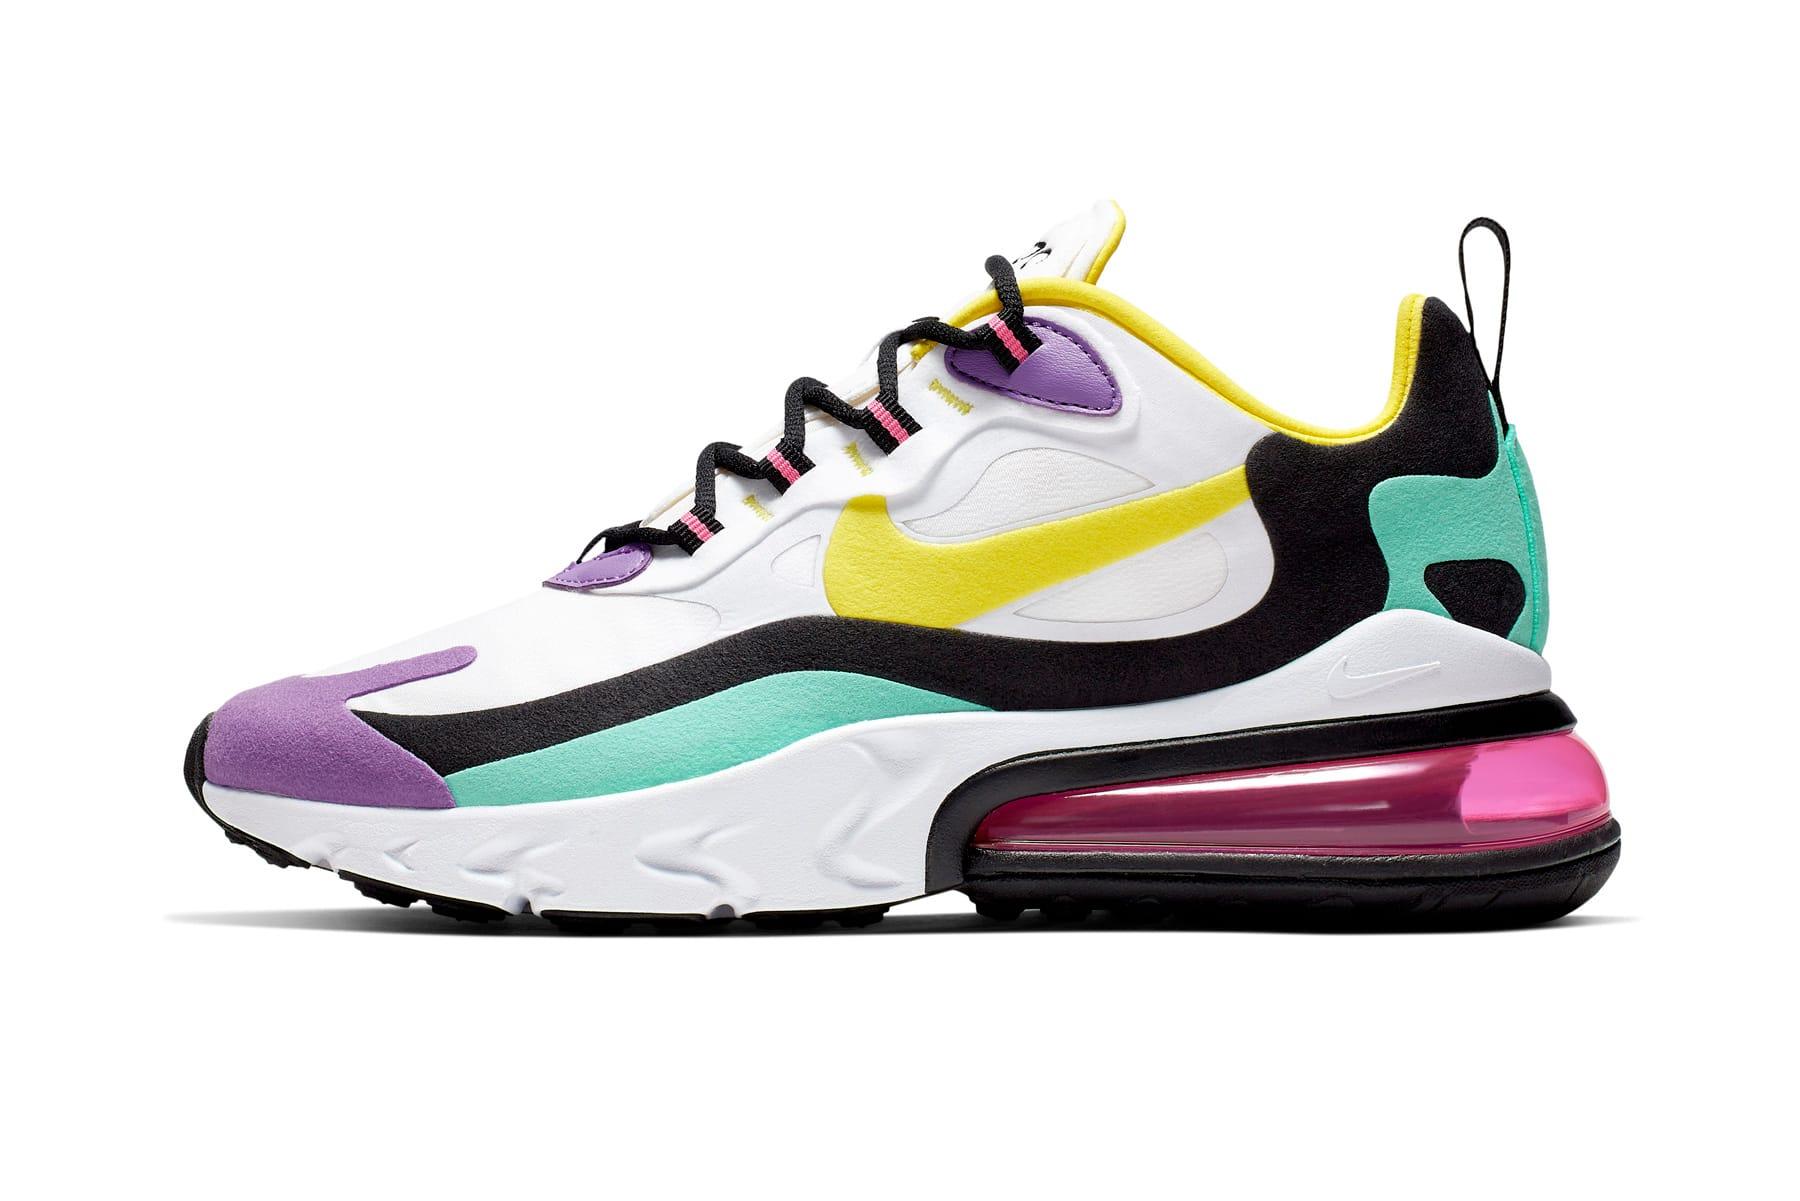 Nike Air Max 270 React Sneaker Release